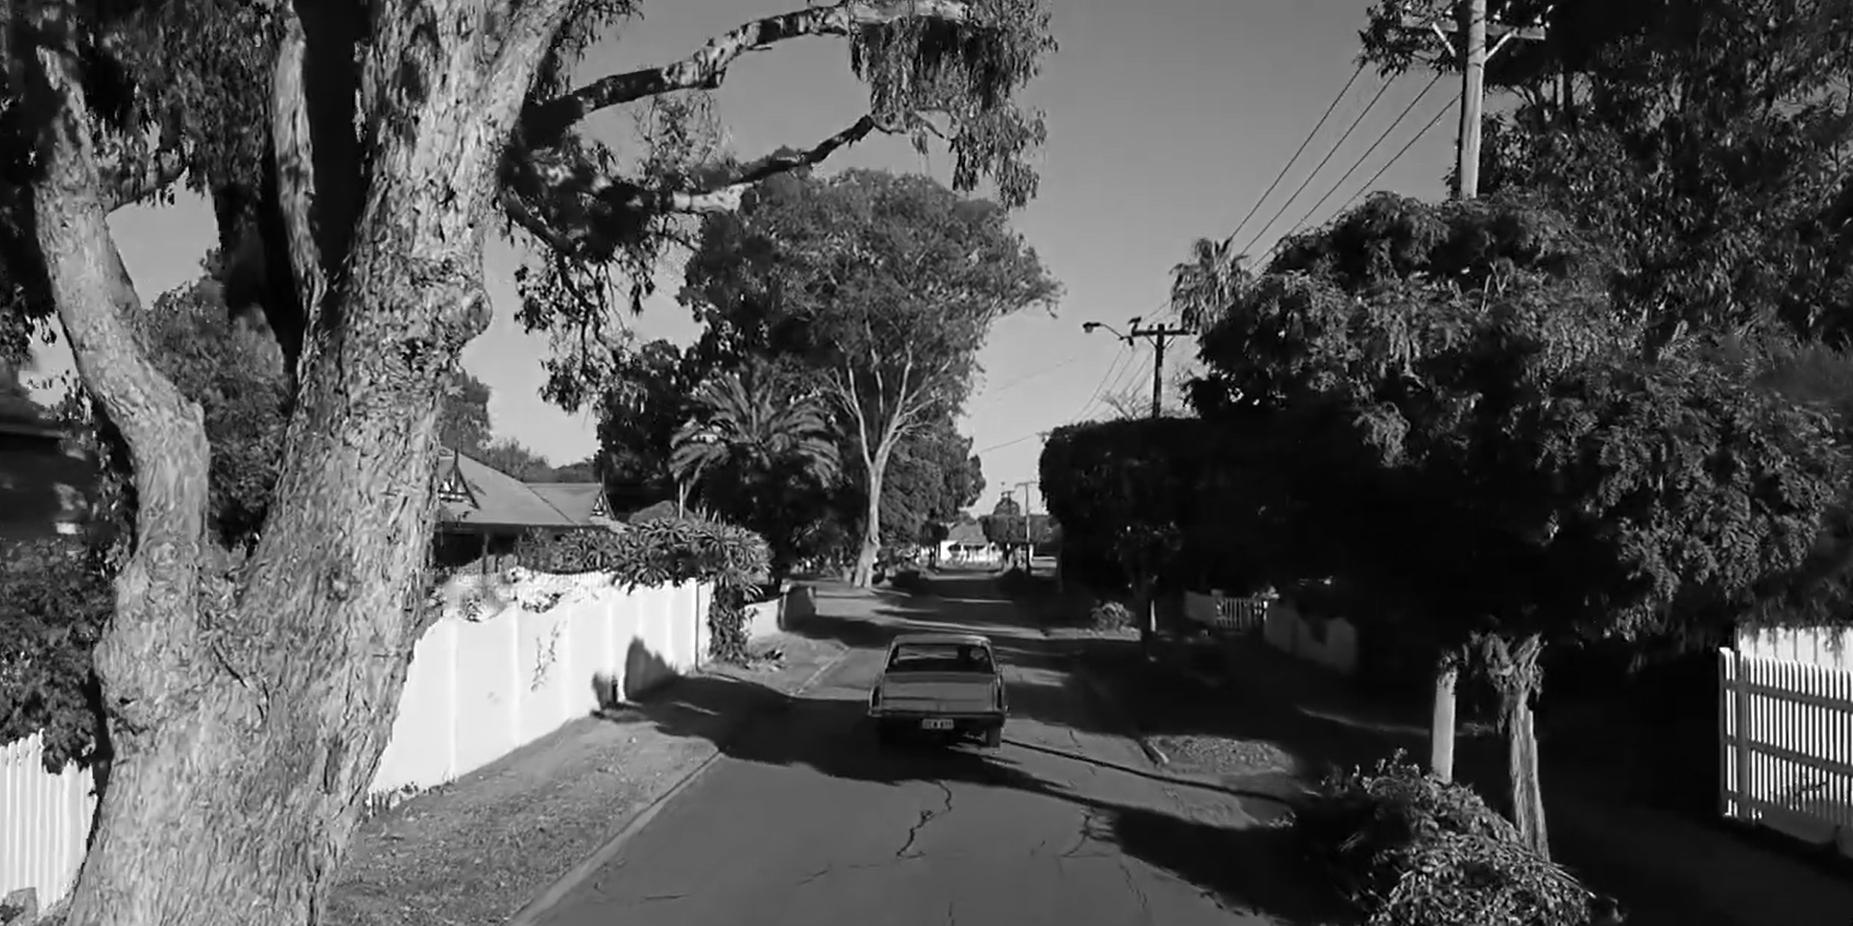 38. Nicholas Rex Wright,  Stained Lead , film, 507 NFS  WINNER - SHORT FILM